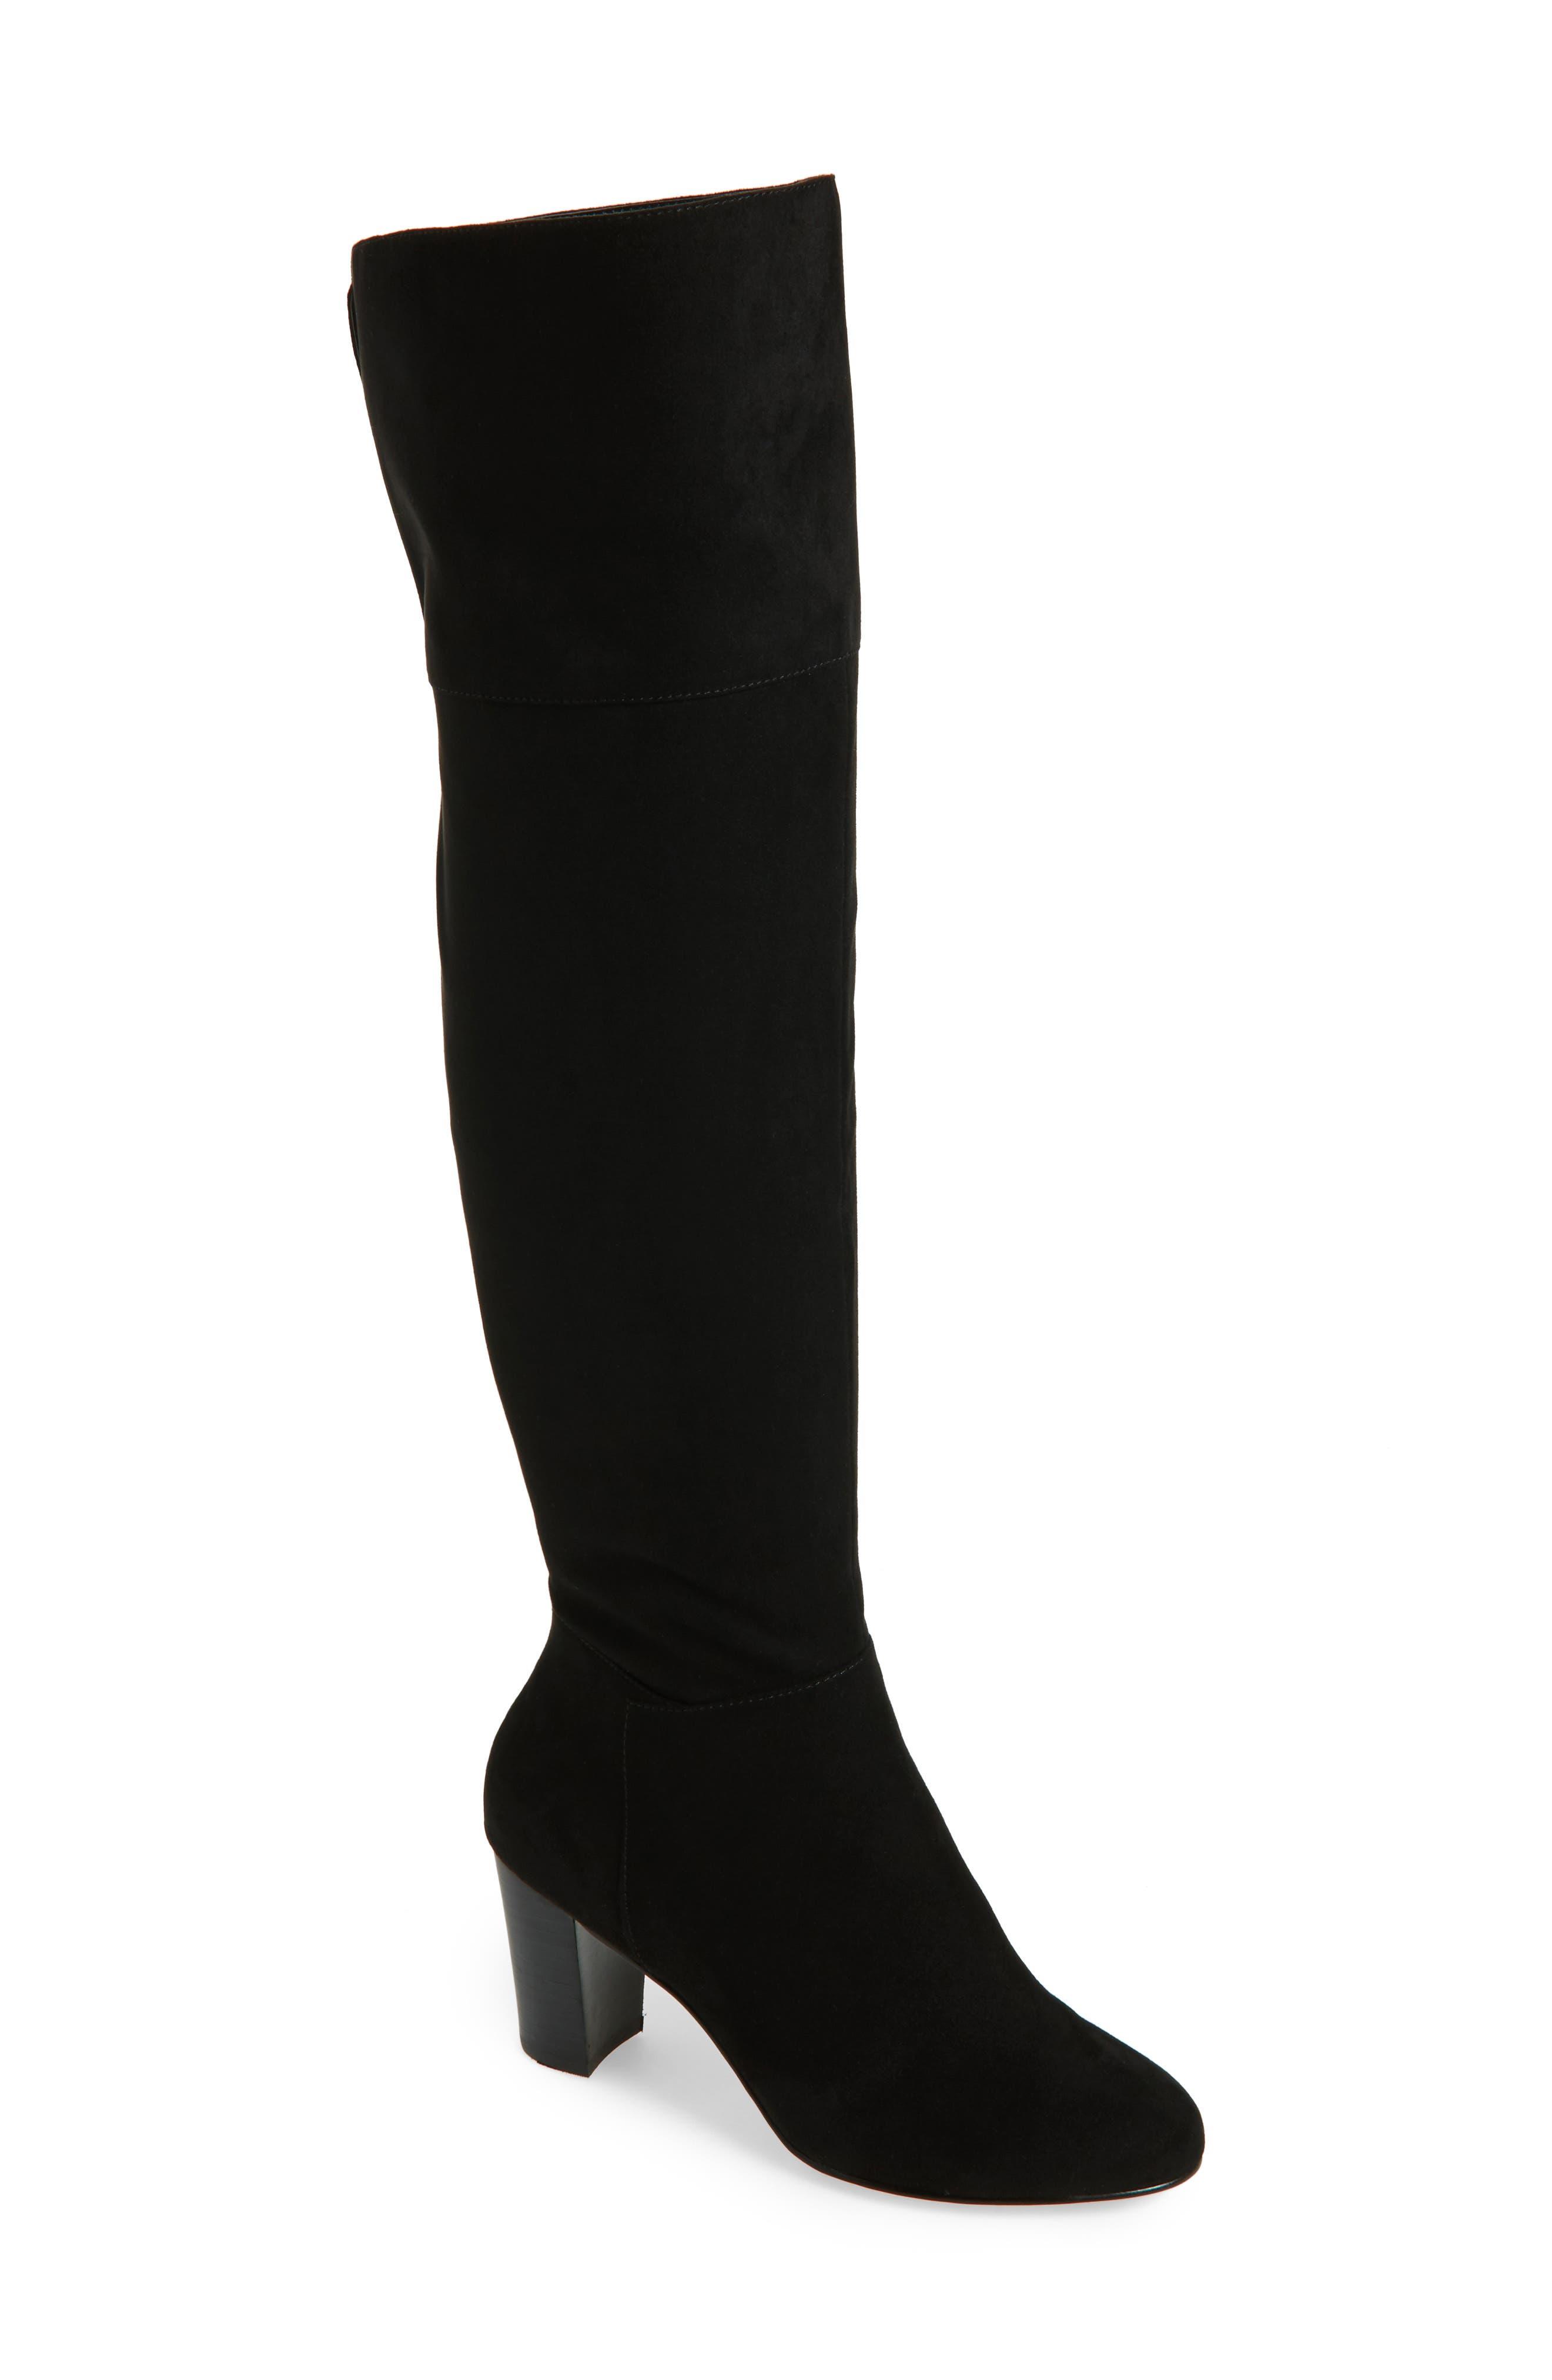 BELLA VITA Telluride II Over the Knee Boot